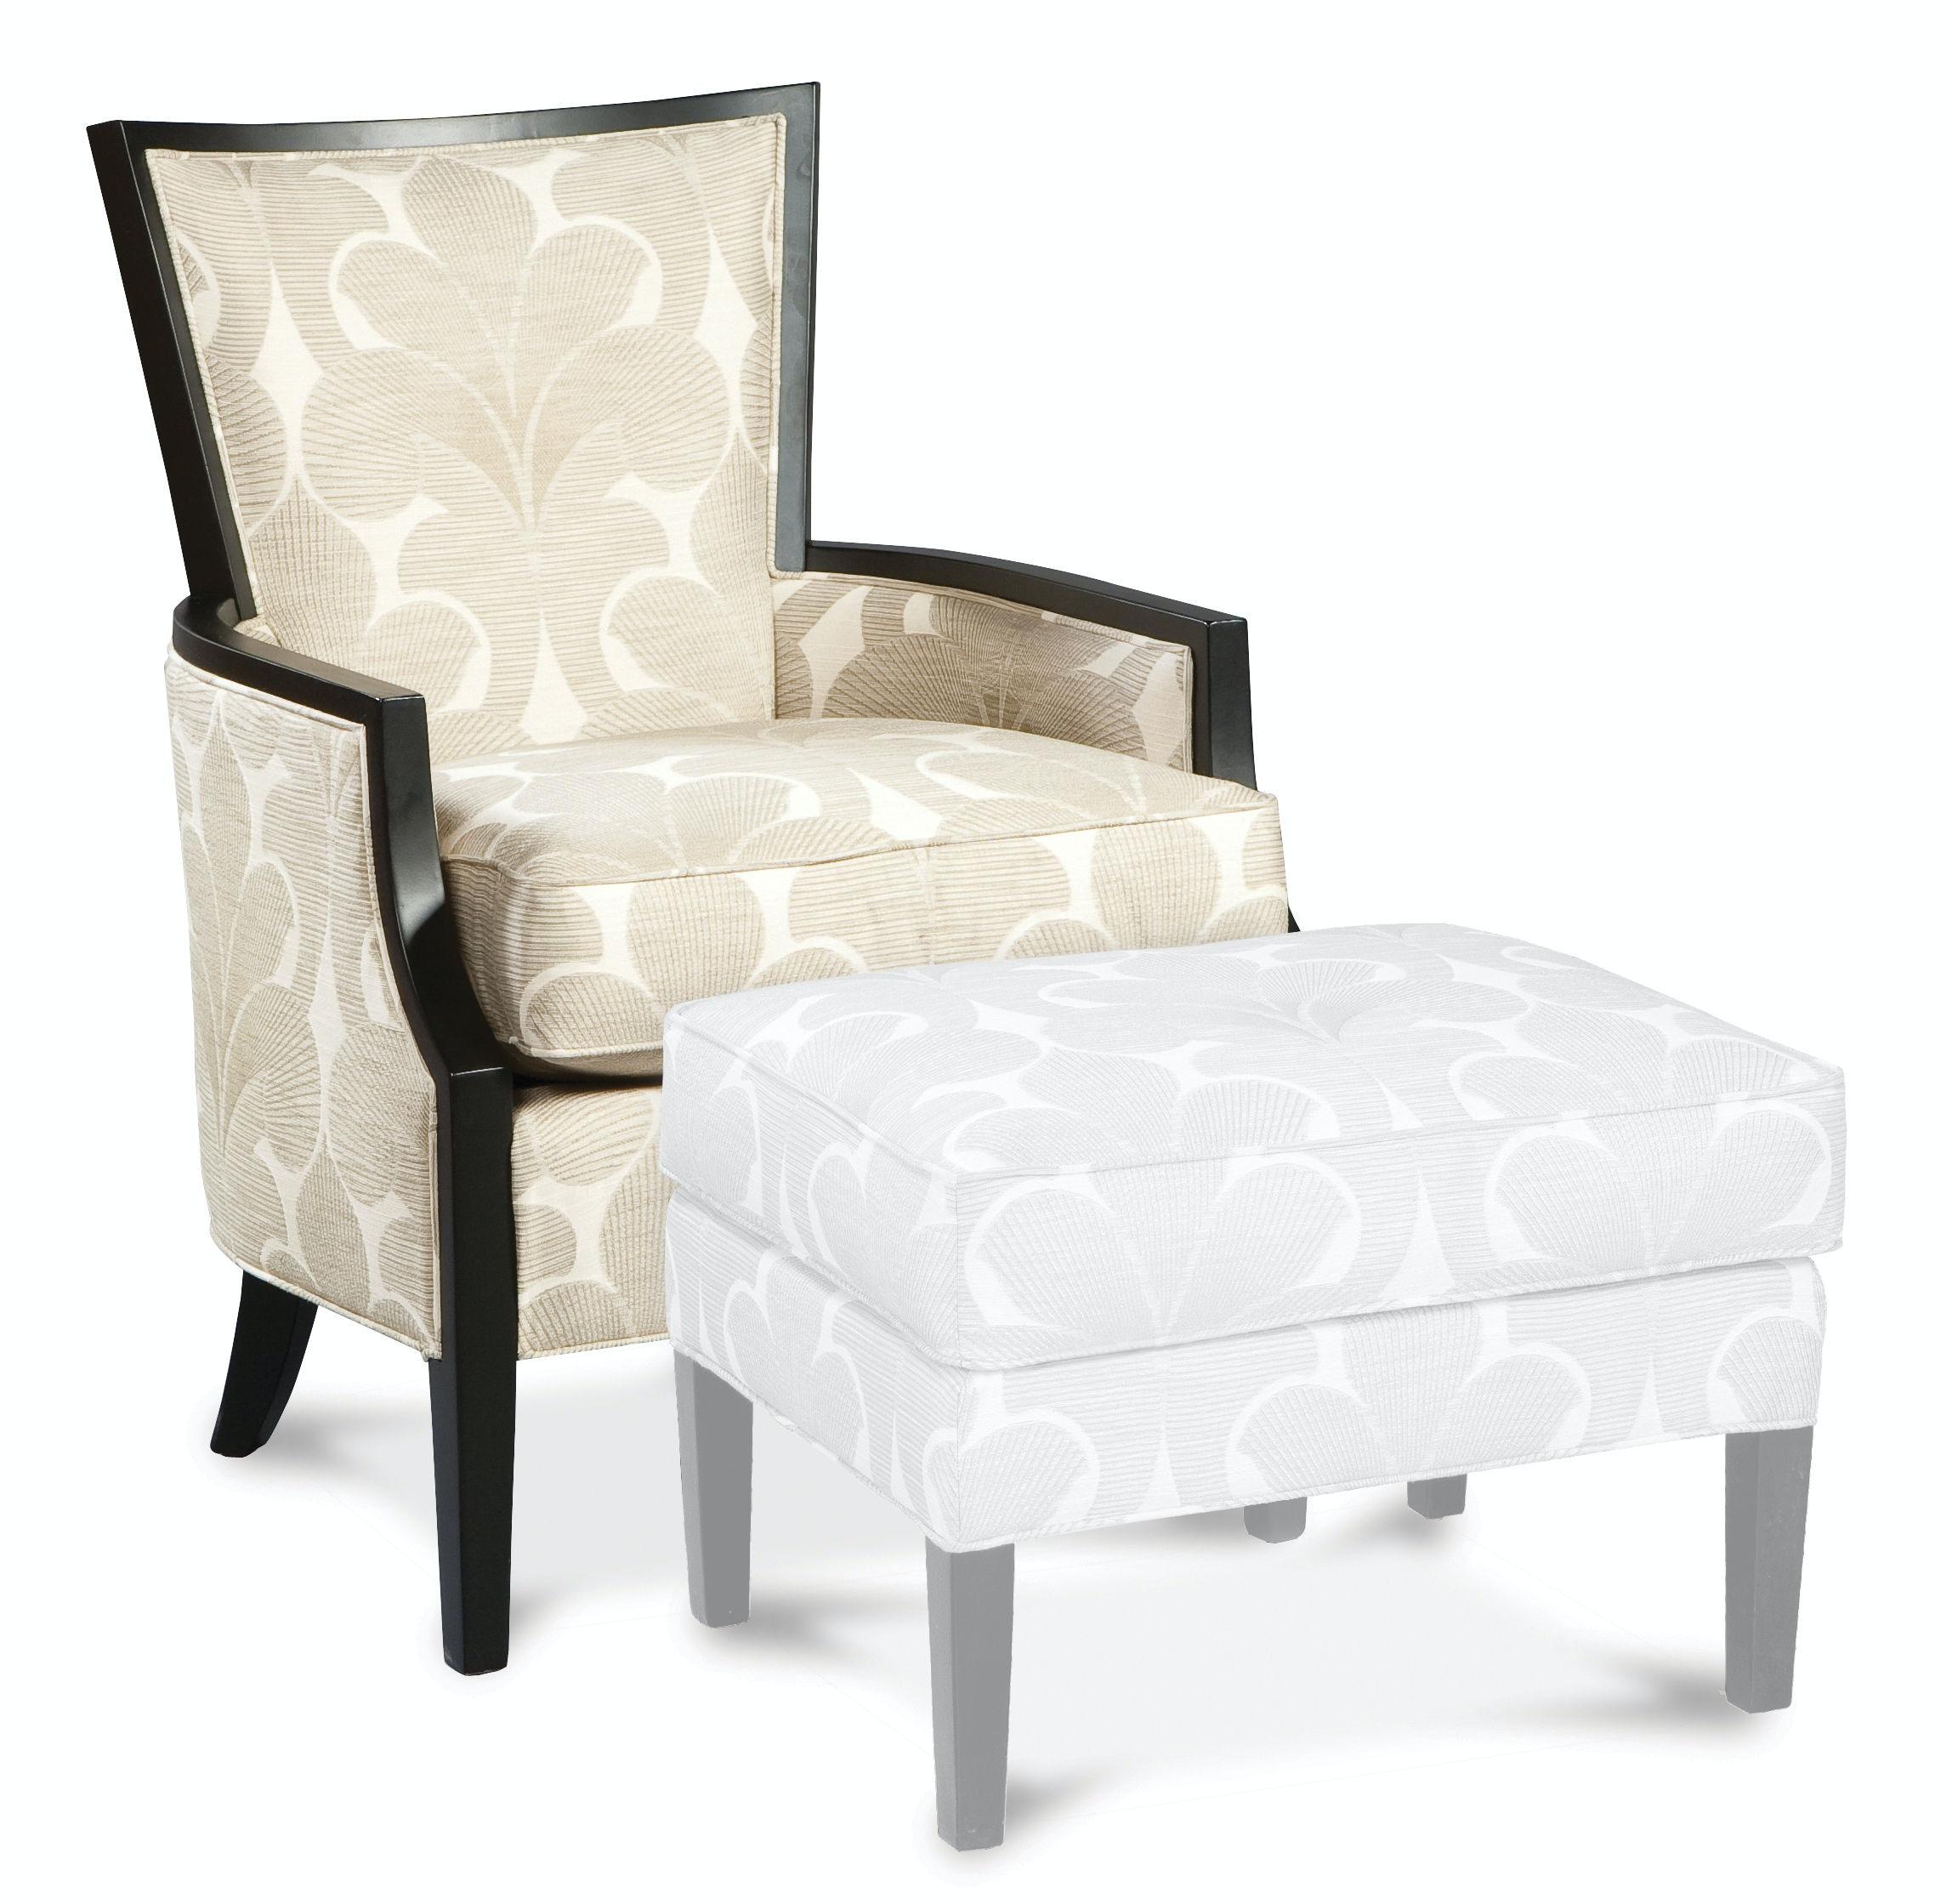 Fairfield Chair pany Living Room Lounge Chair 6011 01